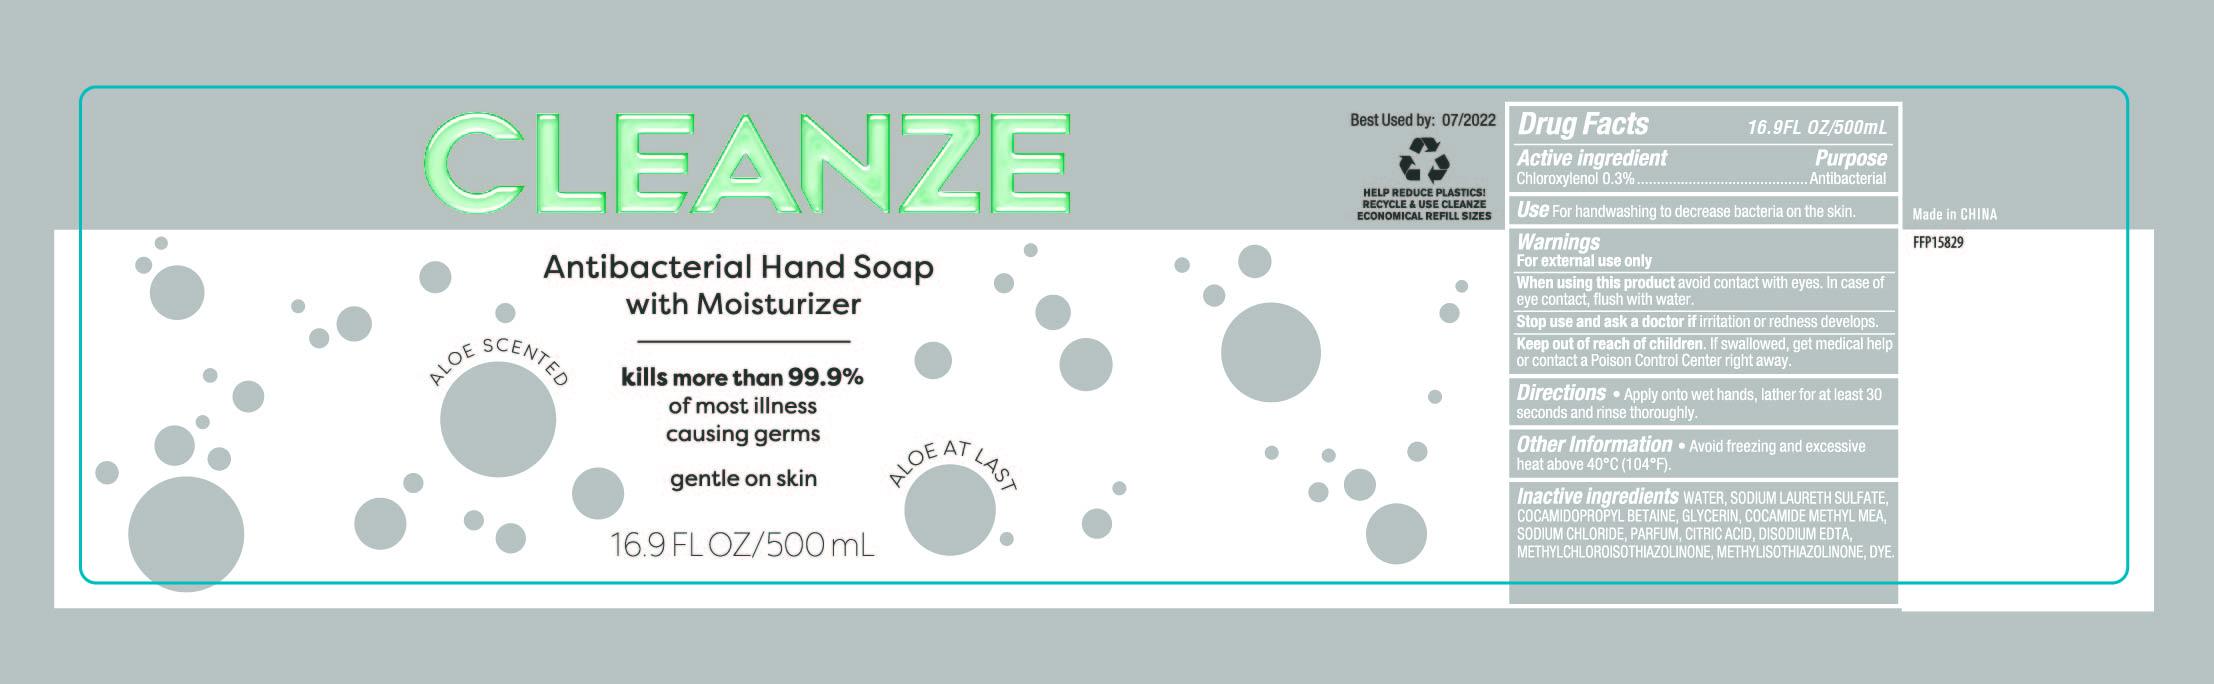 image of Hand Sanitizer 4